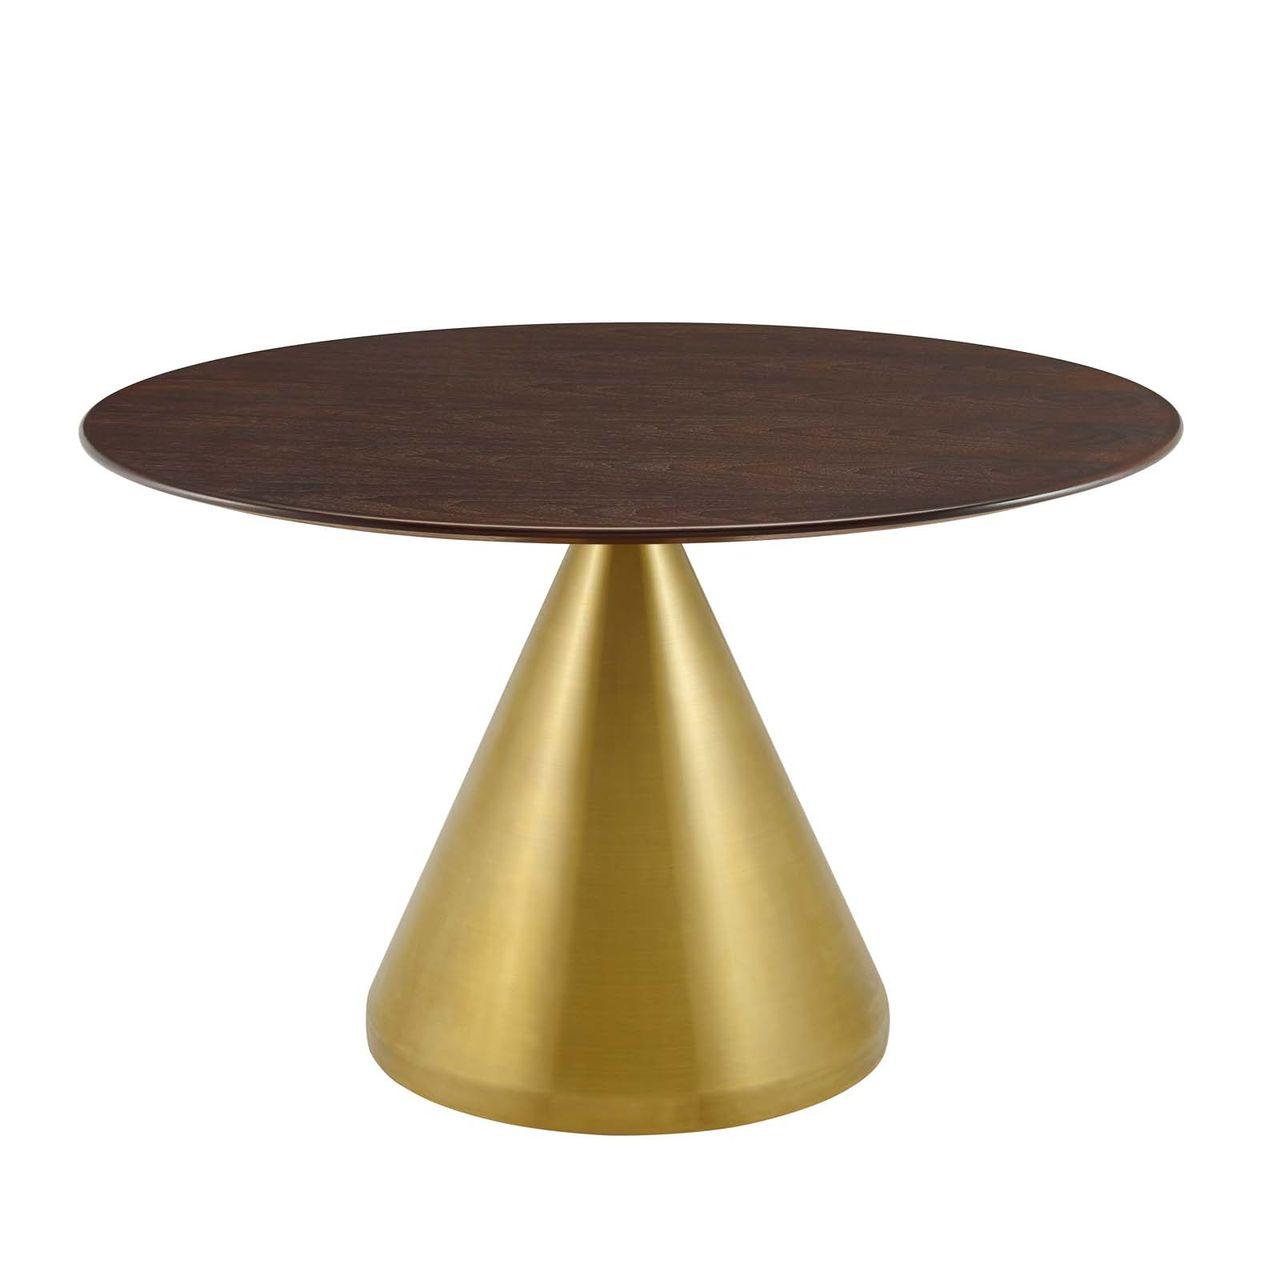 "Modway Tupelo 47"" Dining Table - Gold Cherry Walnut"